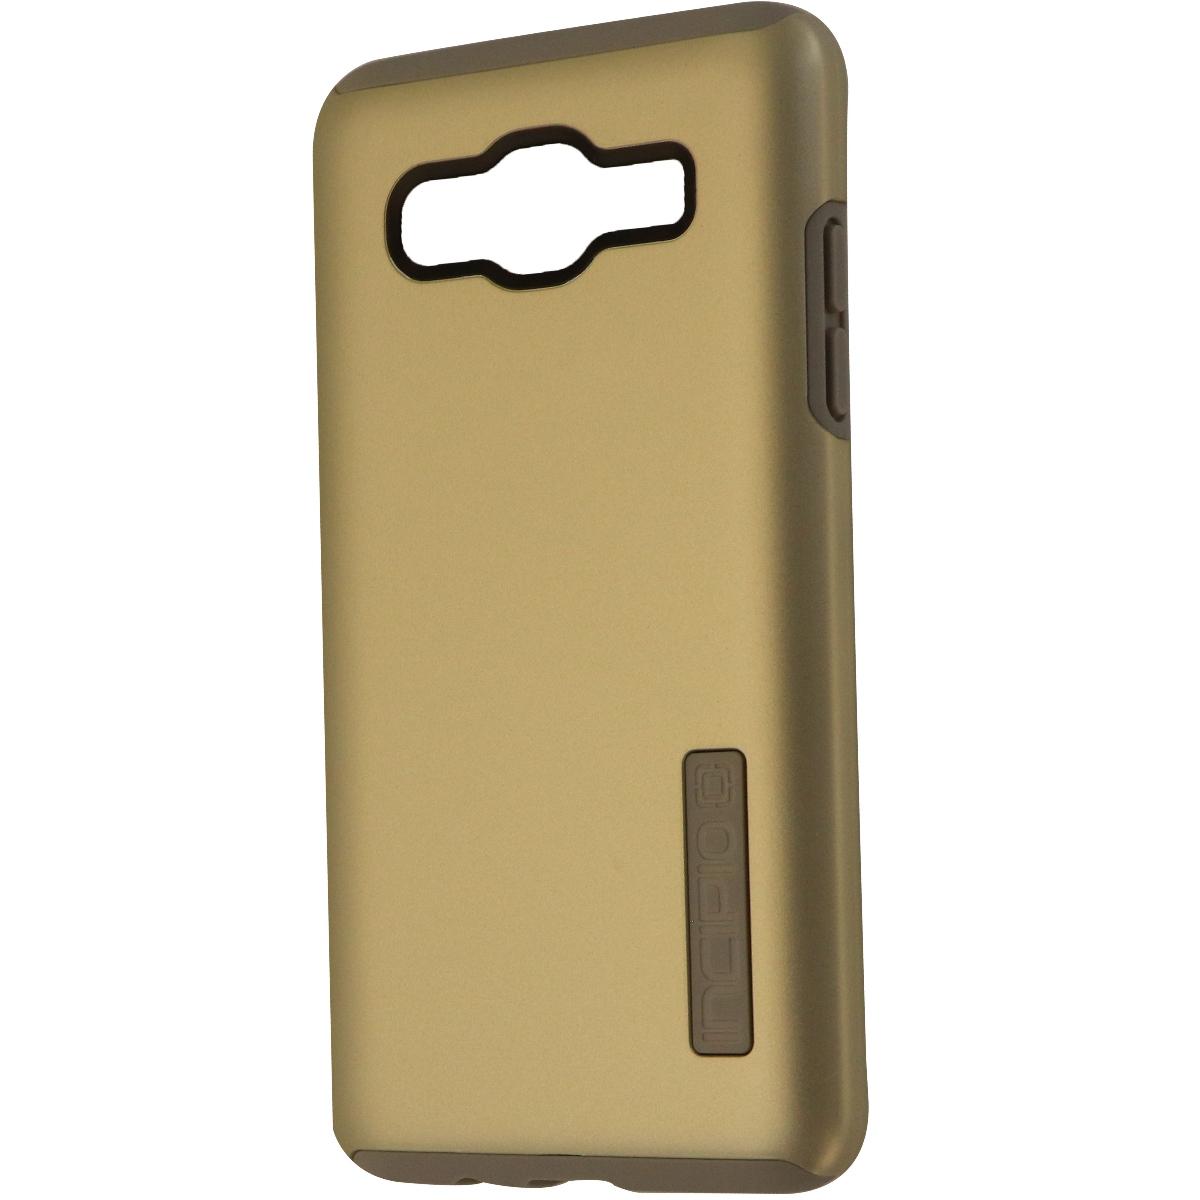 Incipio DualPro Series Dual Layer Case for Samsung Galaxy On5 - Matte Gold/Gray